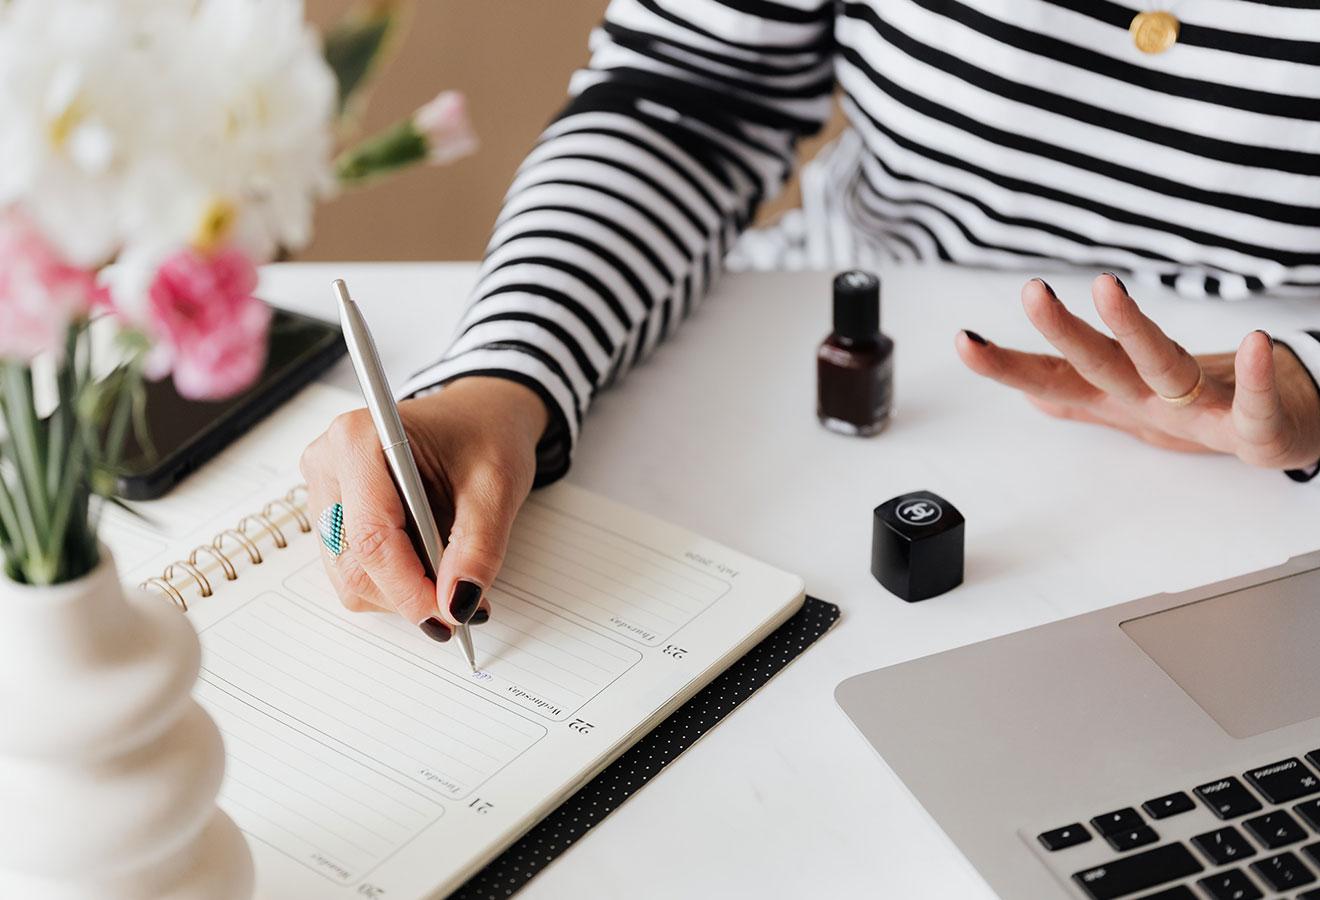 The 5 essentials for successful investing – Episode 96